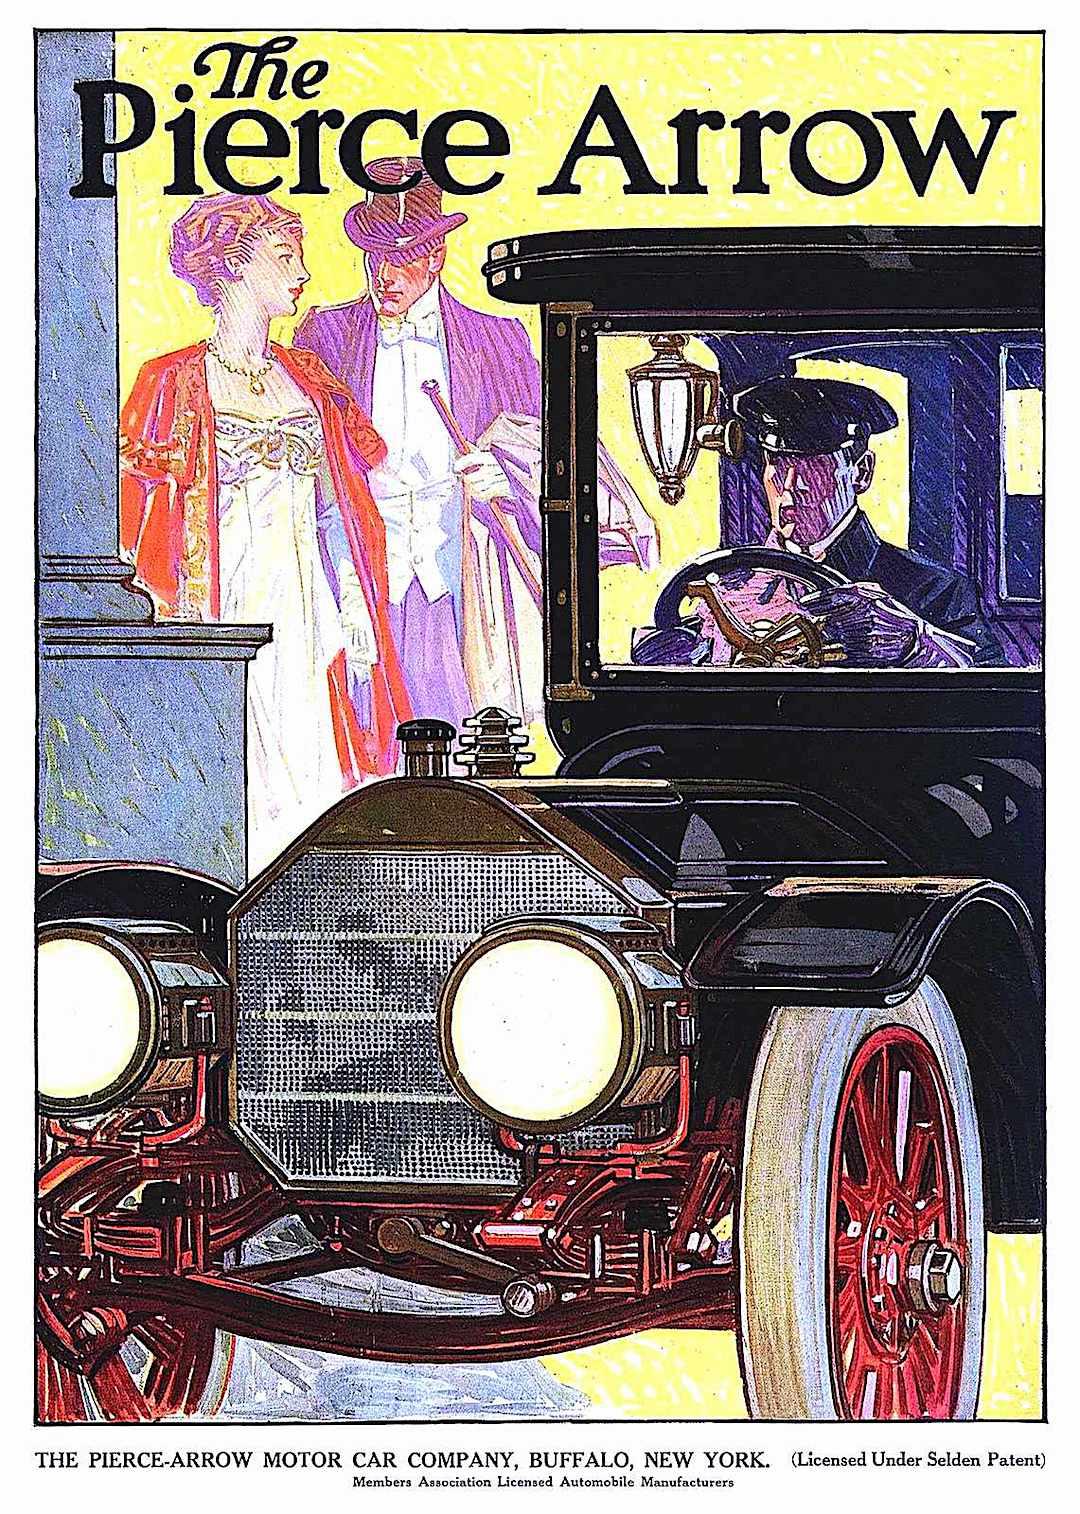 a 1910 Pierce Arrow ad illustration